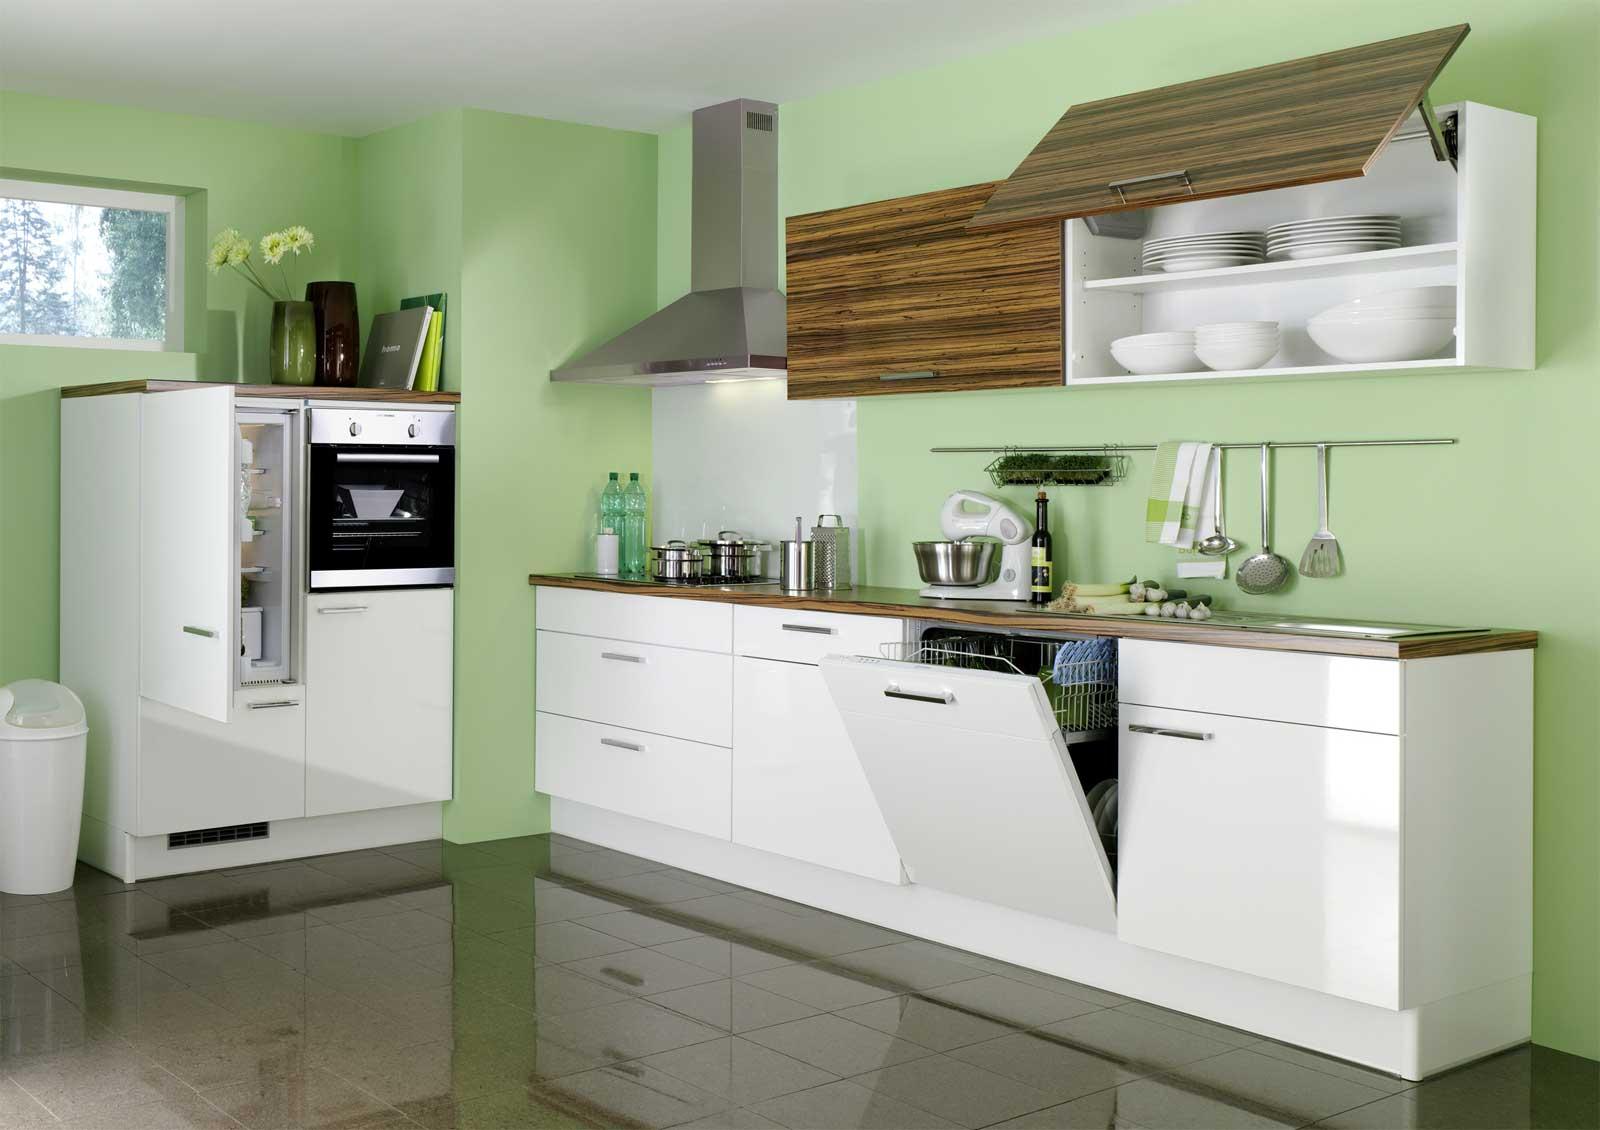 k che die hertogenwaldg rten eupen belgien. Black Bedroom Furniture Sets. Home Design Ideas